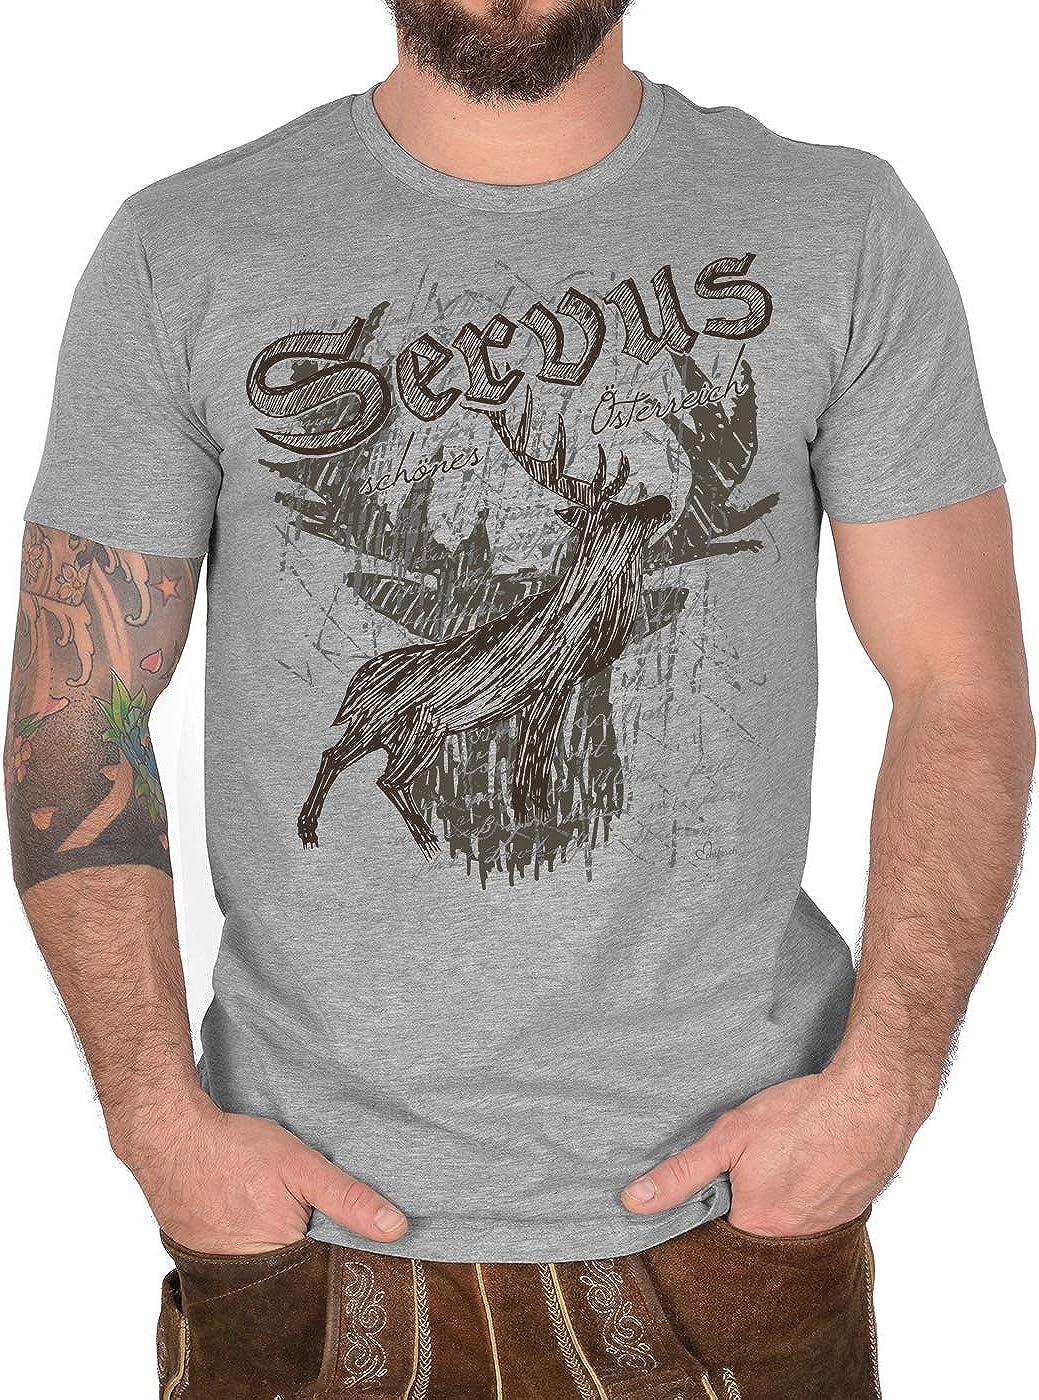 Trachten-Shirt Herren Hirsch Motiv T-Shirt Servus sch/önes /Österreich Tracht Trachtenshirt Trachtenmotiv zur Lederhose Heimat Landliebe